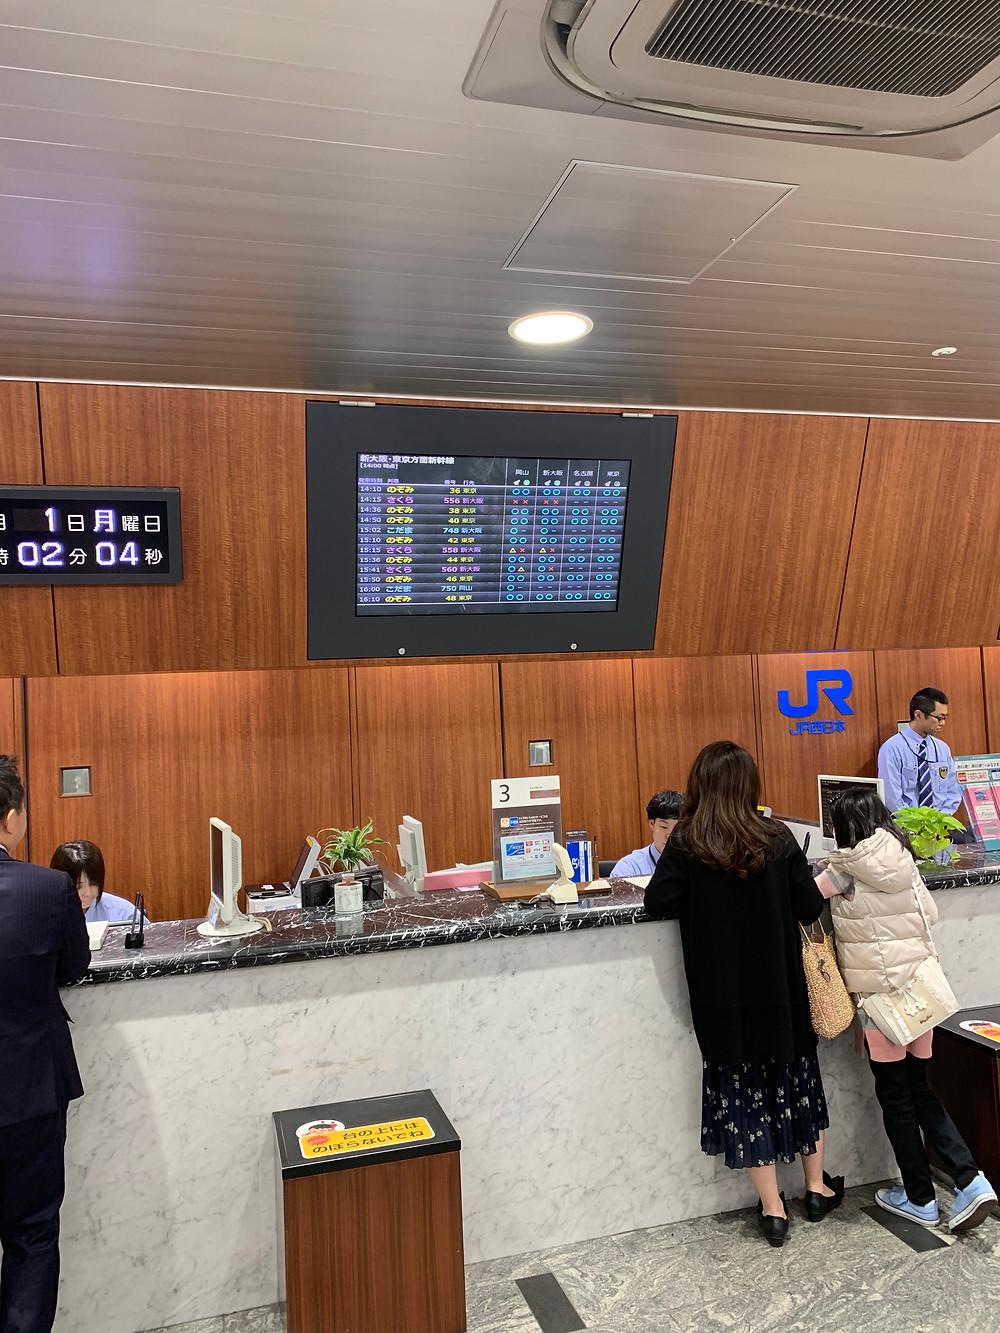 JR Ticket office at Hakata station